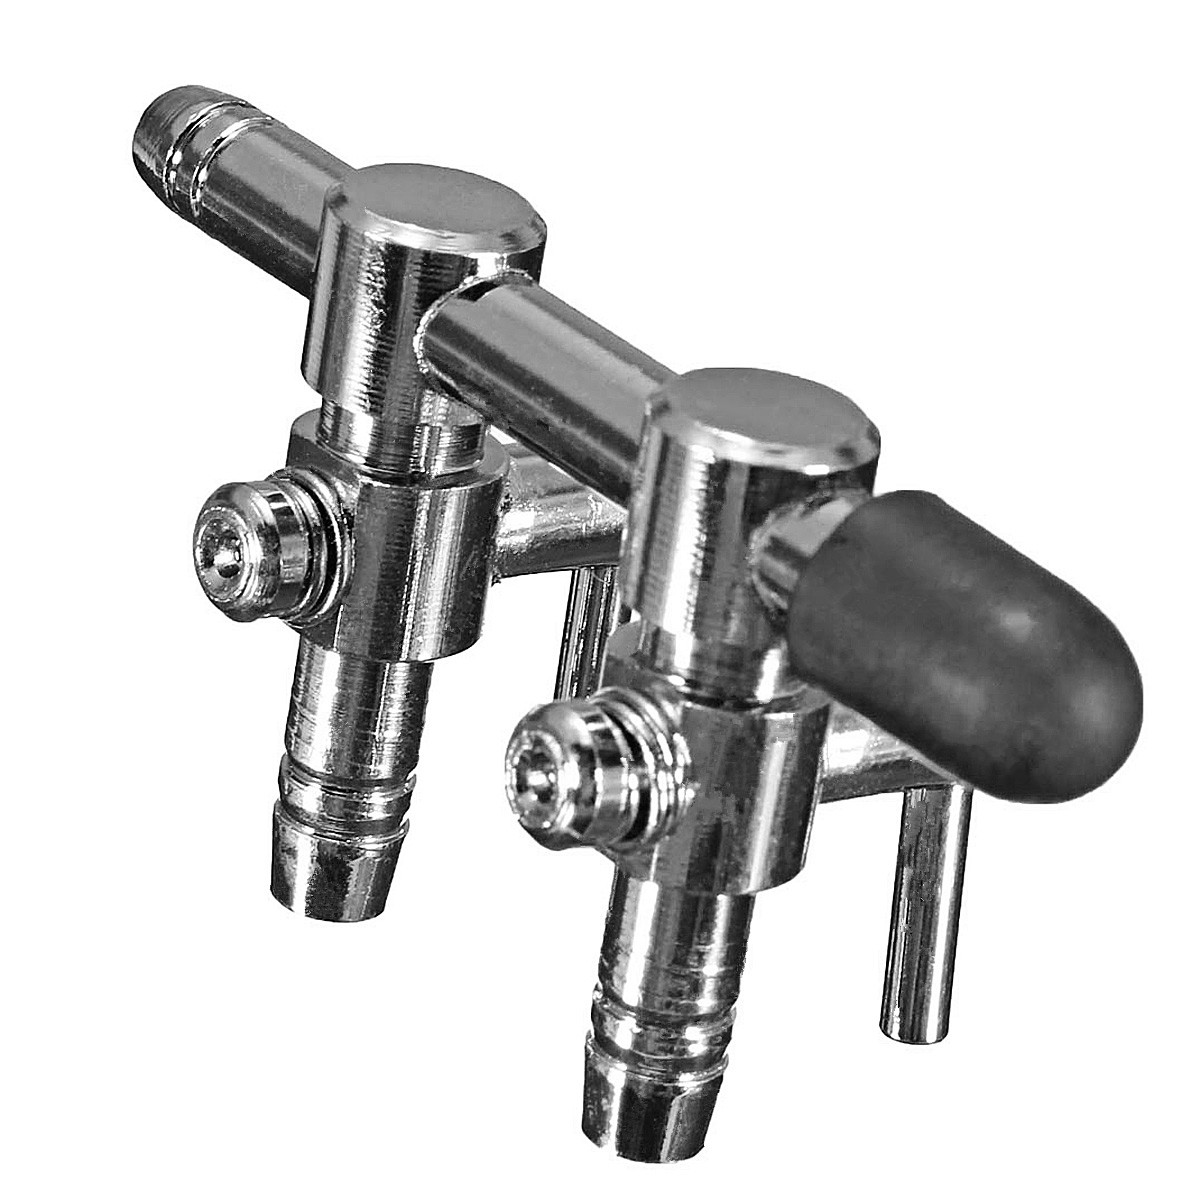 New aquarium tank air pump flow tube pipe line